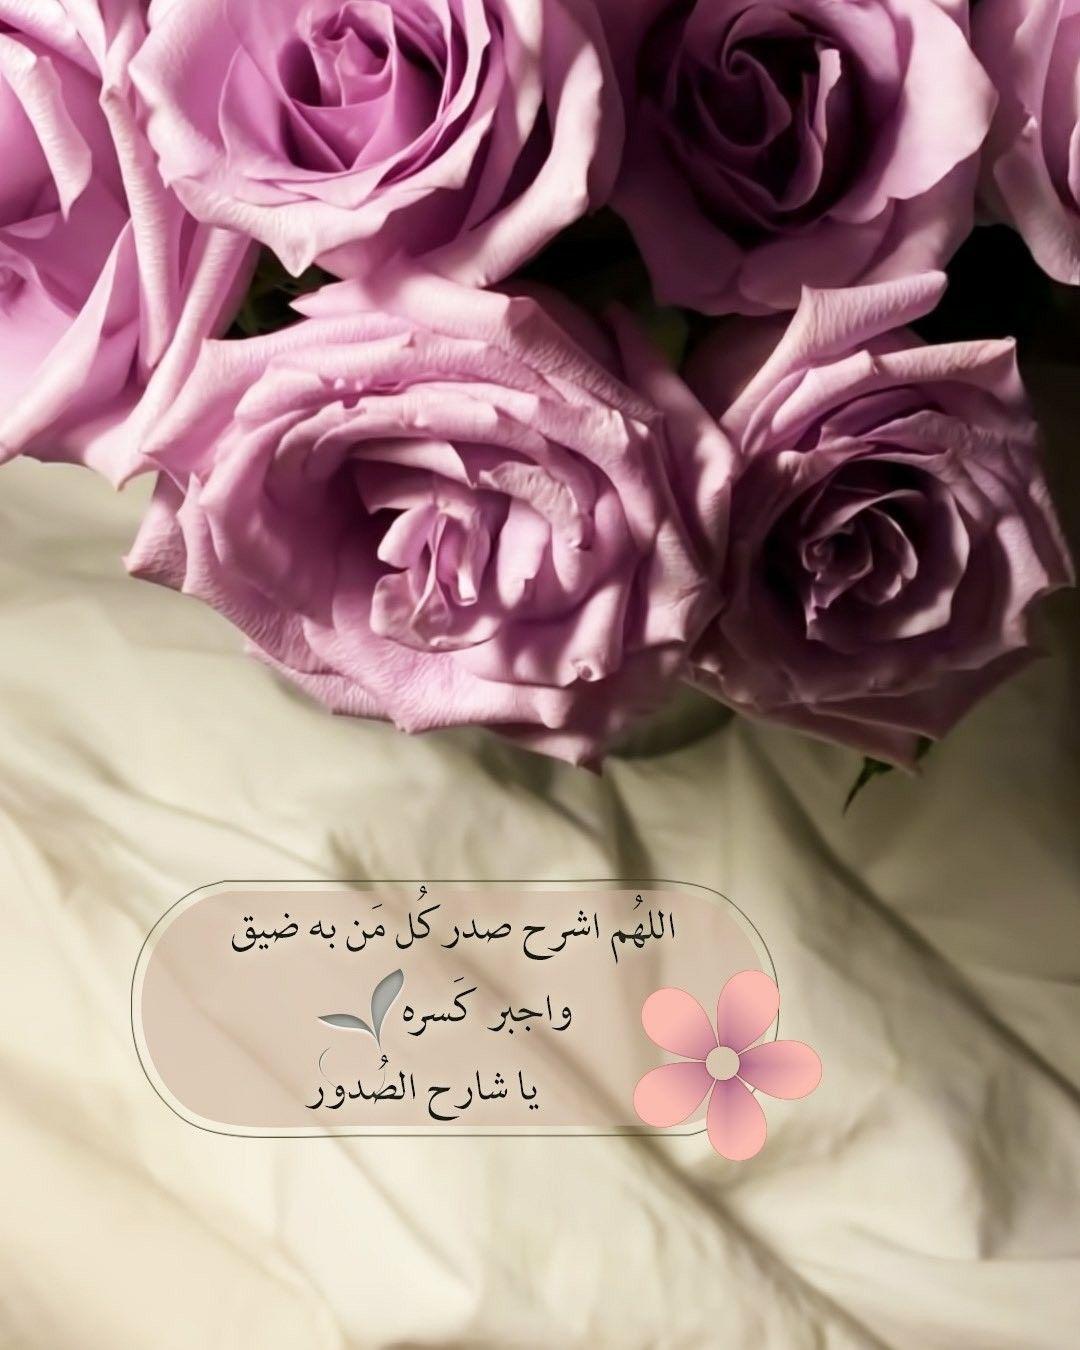 Pin By Rabab Roshdy On احلى كلام بأحلى خلفيات Islam Facts Rose Duaa Islam